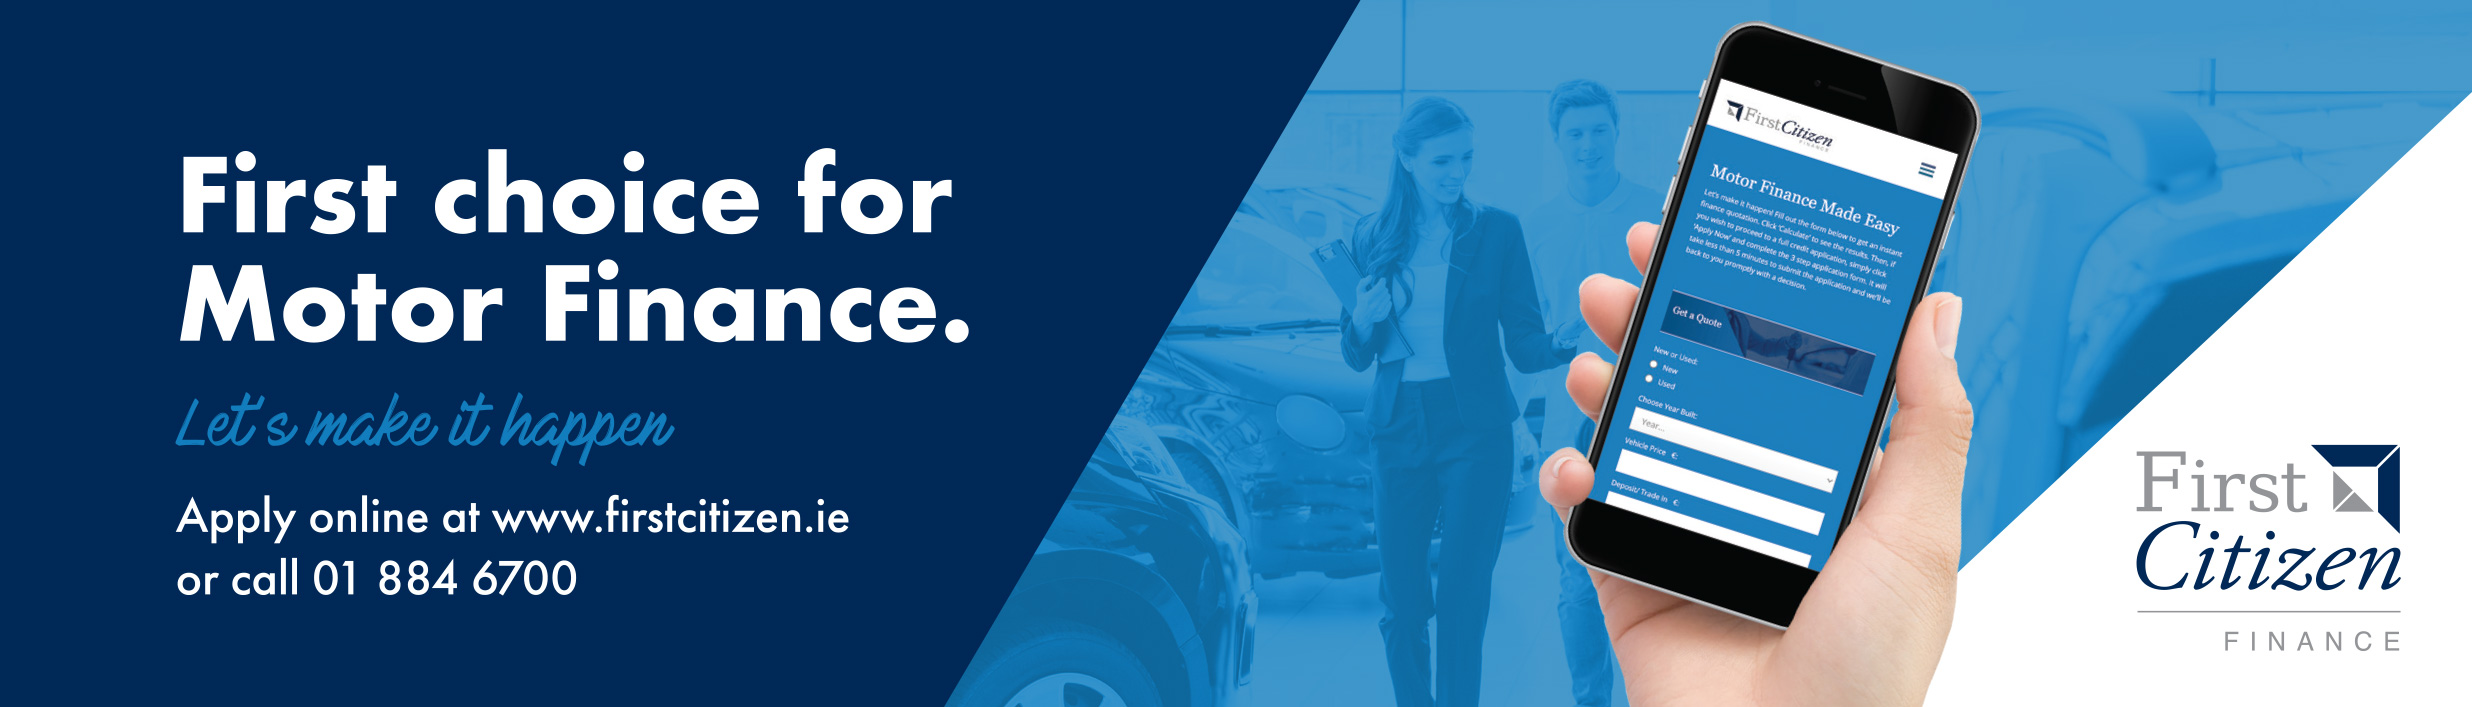 First Citizen Finance finance partners for Brand New Drive